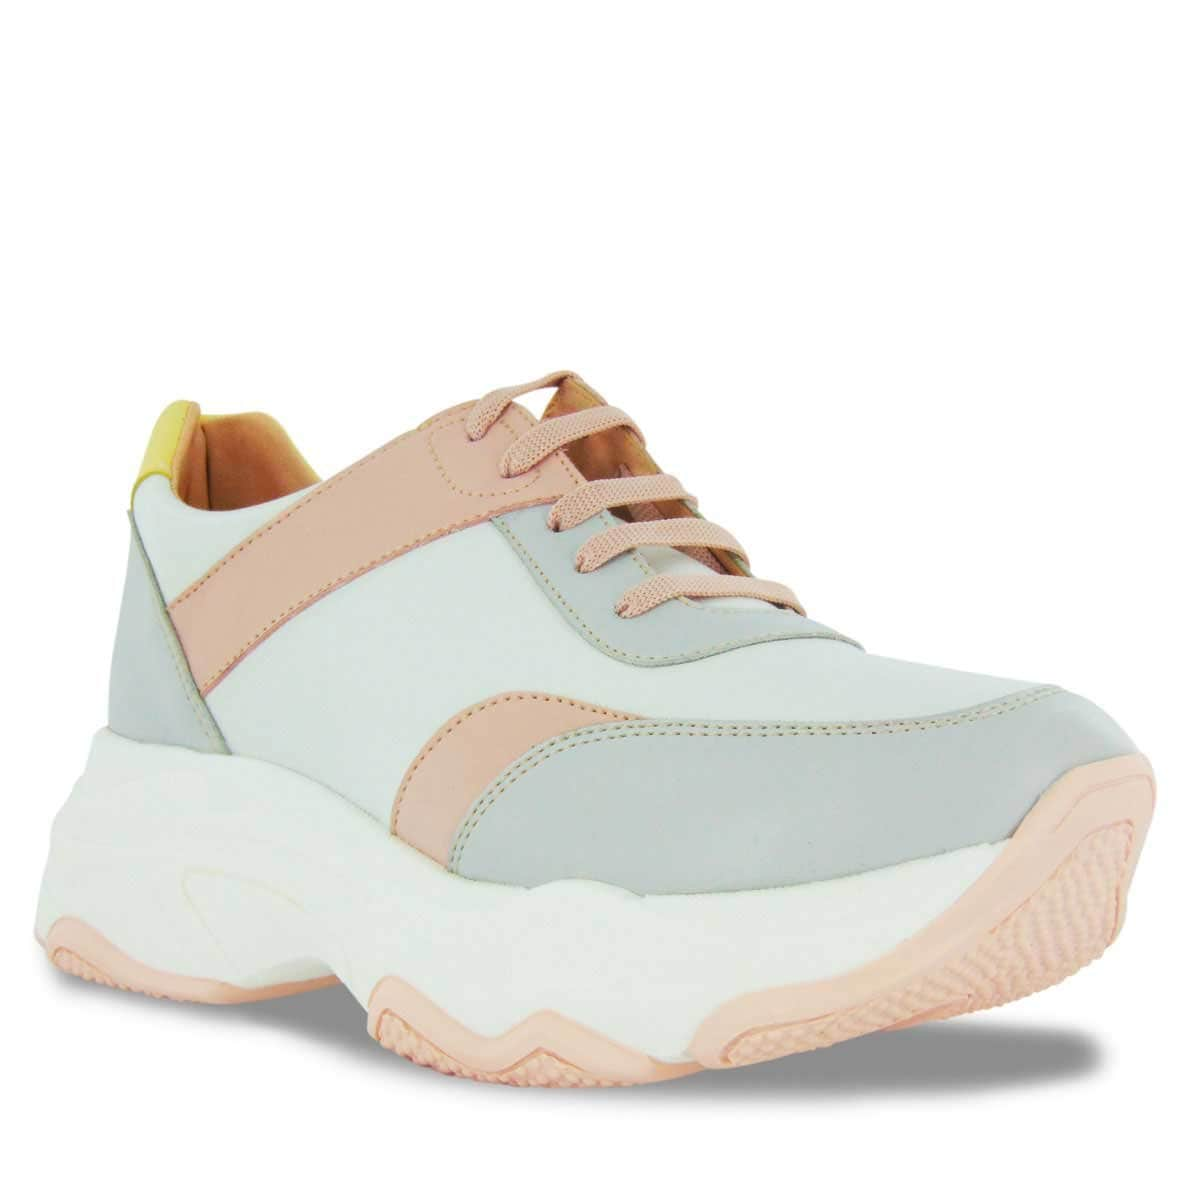 Tenis Ugly Shoe Blanco Mbj